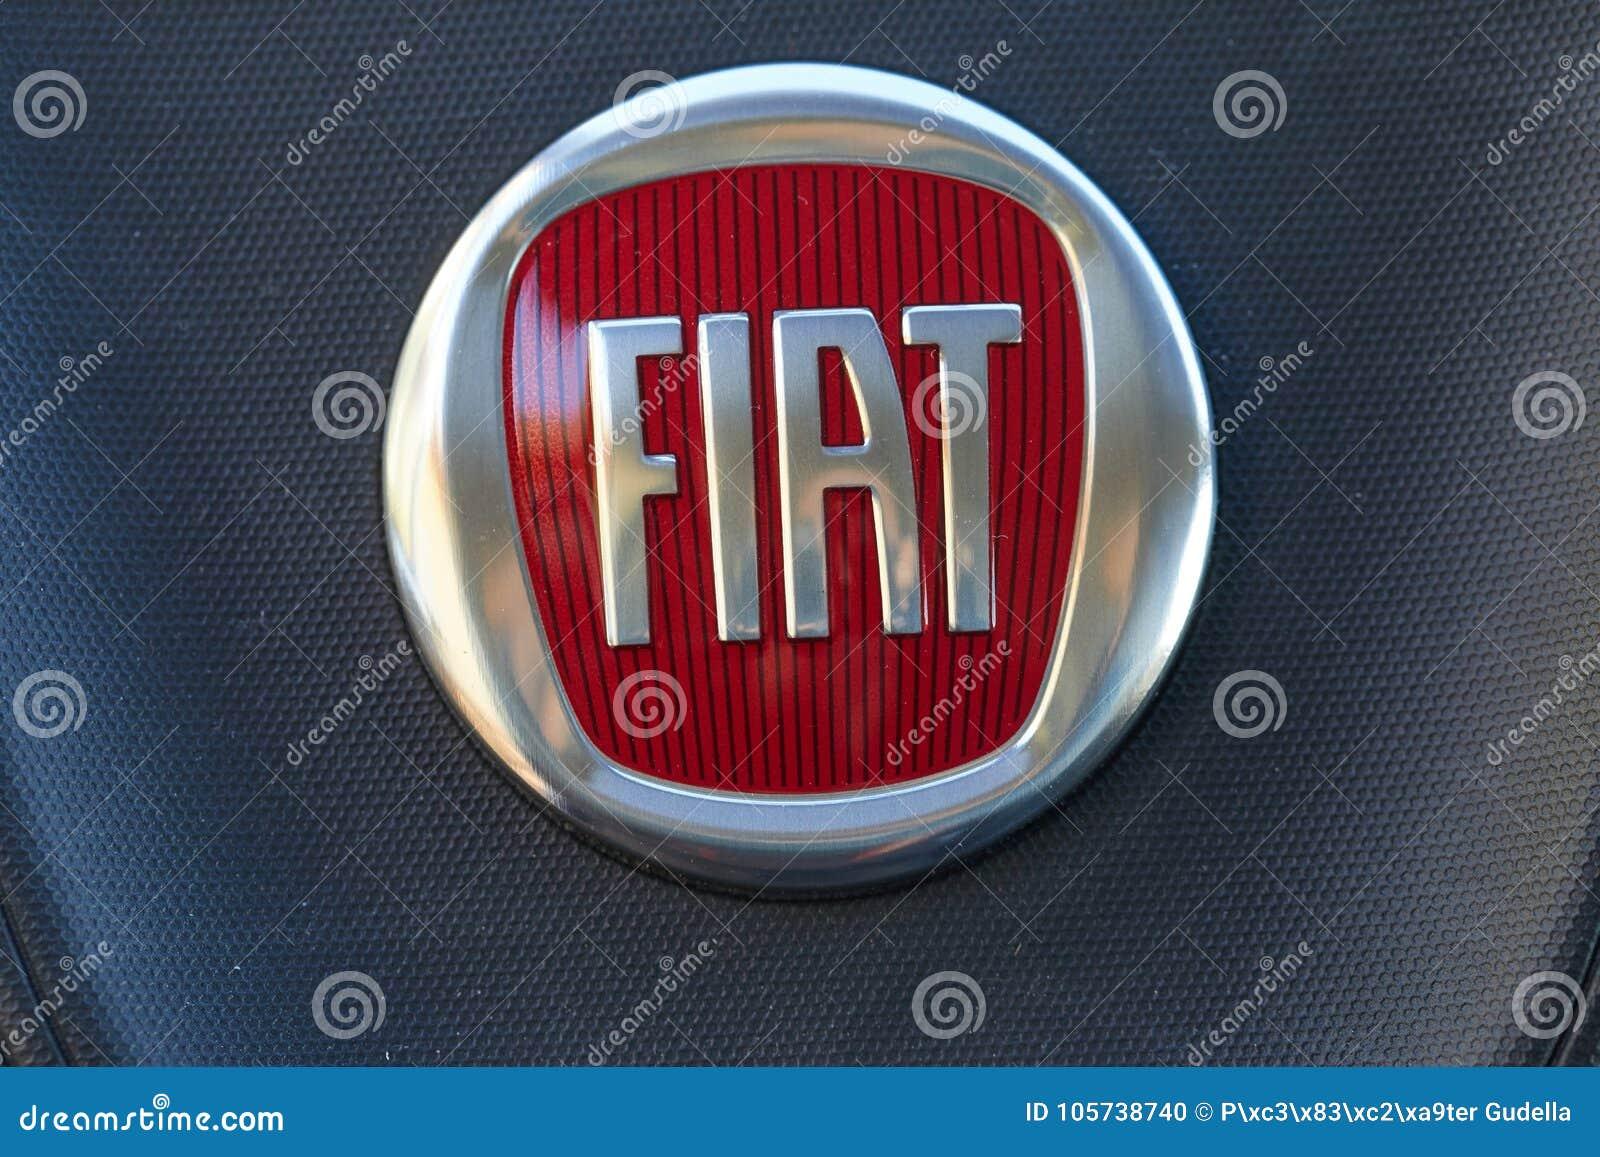 Fiat Car Logo Editorial Image Image Of Manufacturer 105738740